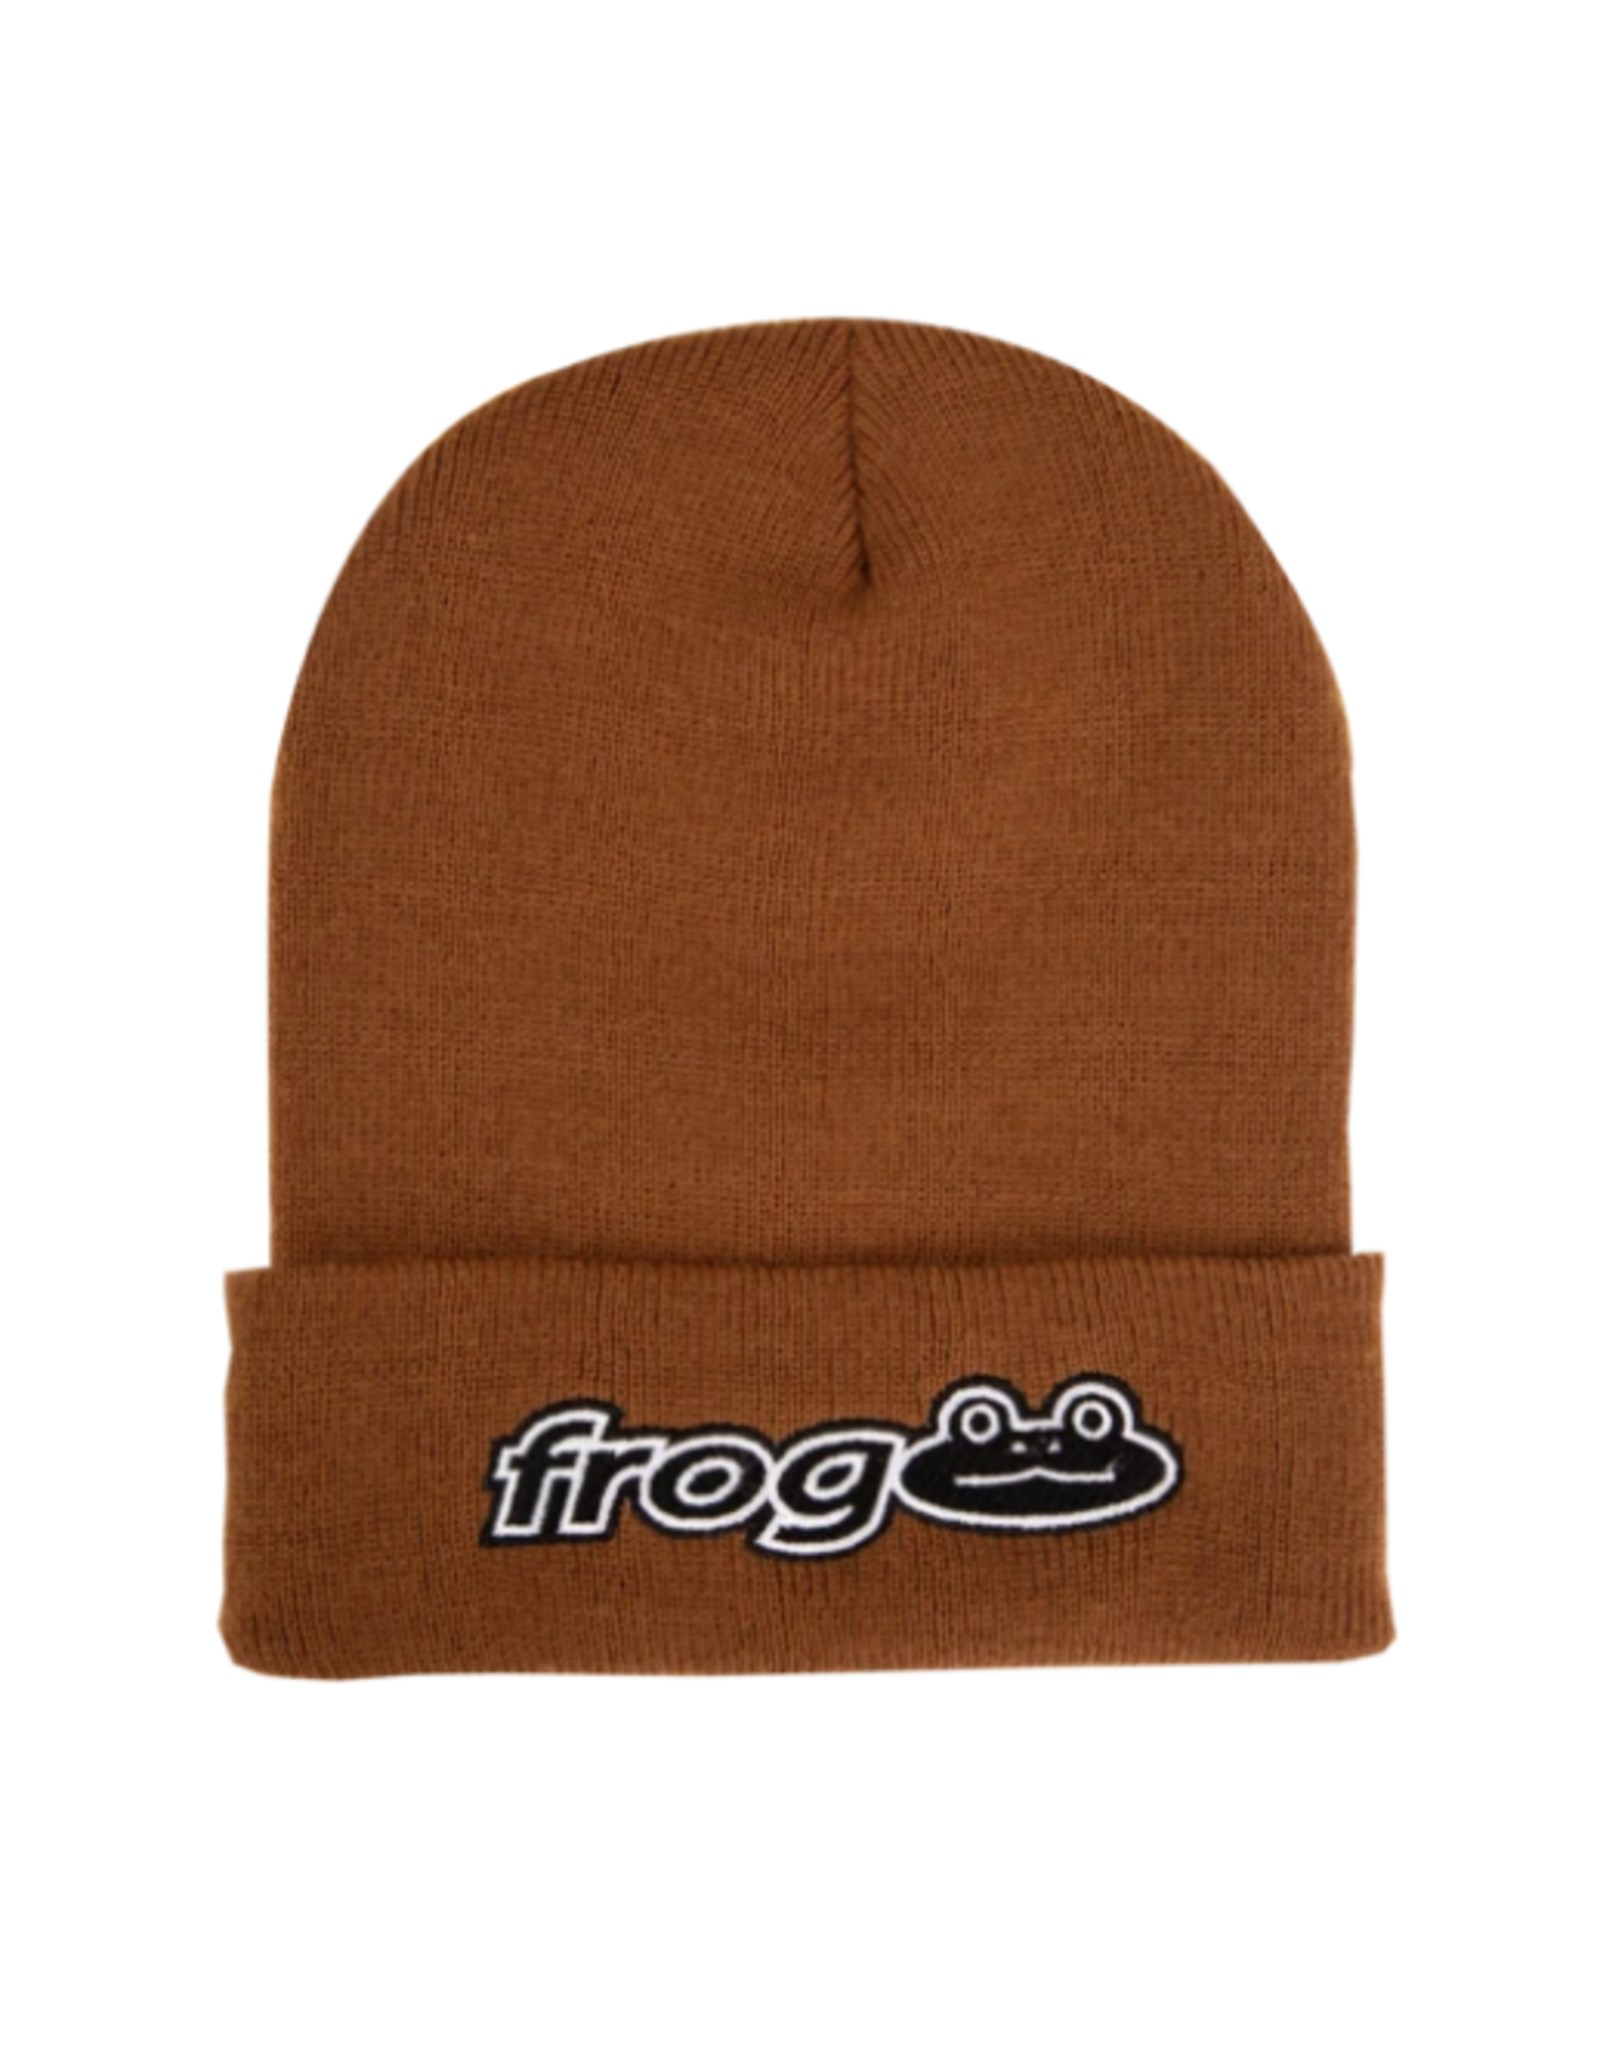 Frog Works Beanie - Caramel